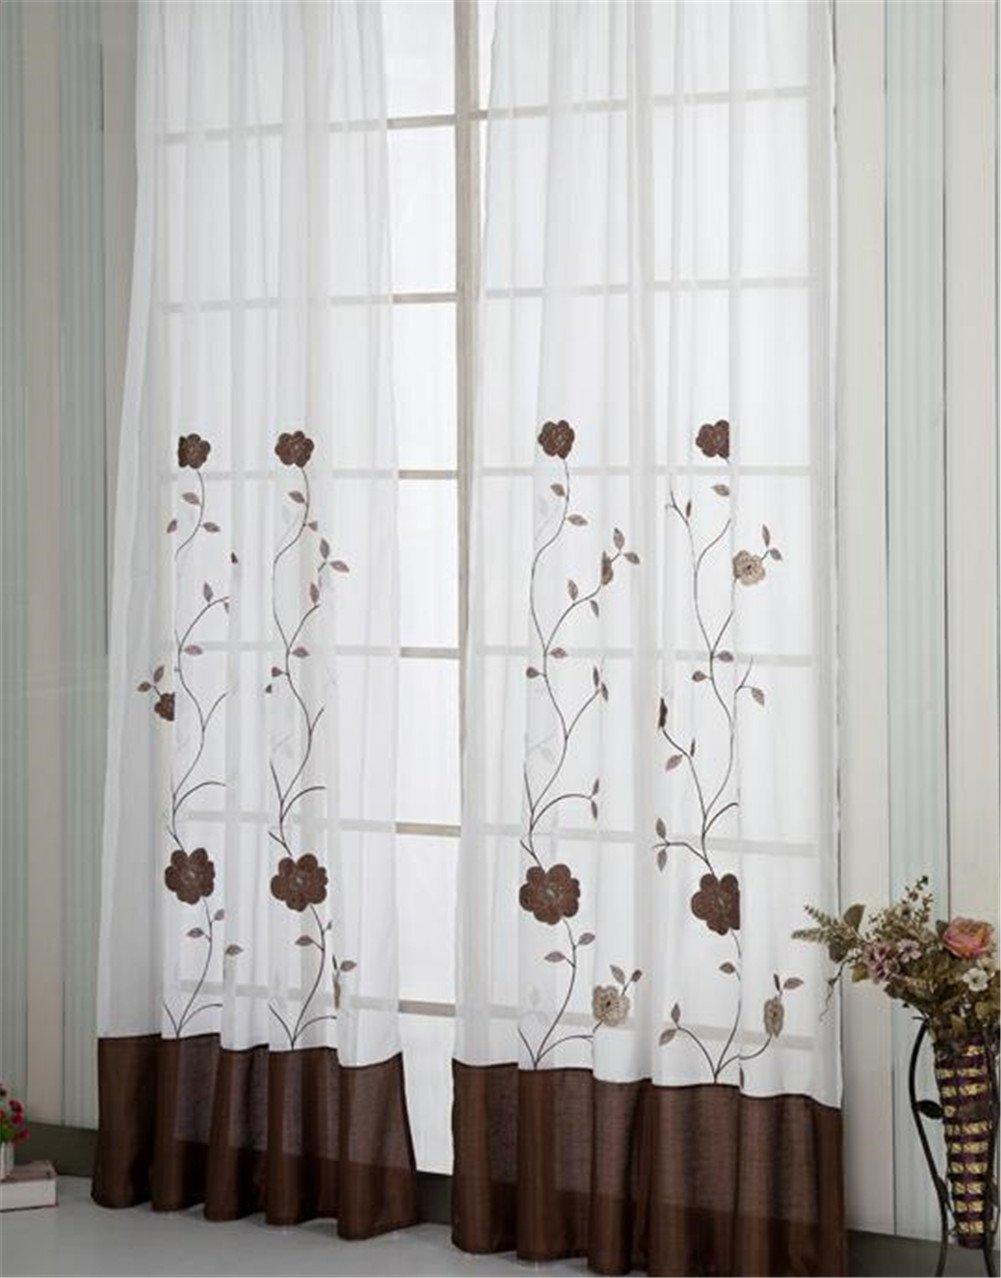 Oesenvorhang Transparent Gardinen Vorhang Schlaufenschal Schlaufenschal Schlaufenschal Deko fuer Wohnzimmer BH 140245 CM Lila B073WWQ13X Fensterdekoration d3e6c1